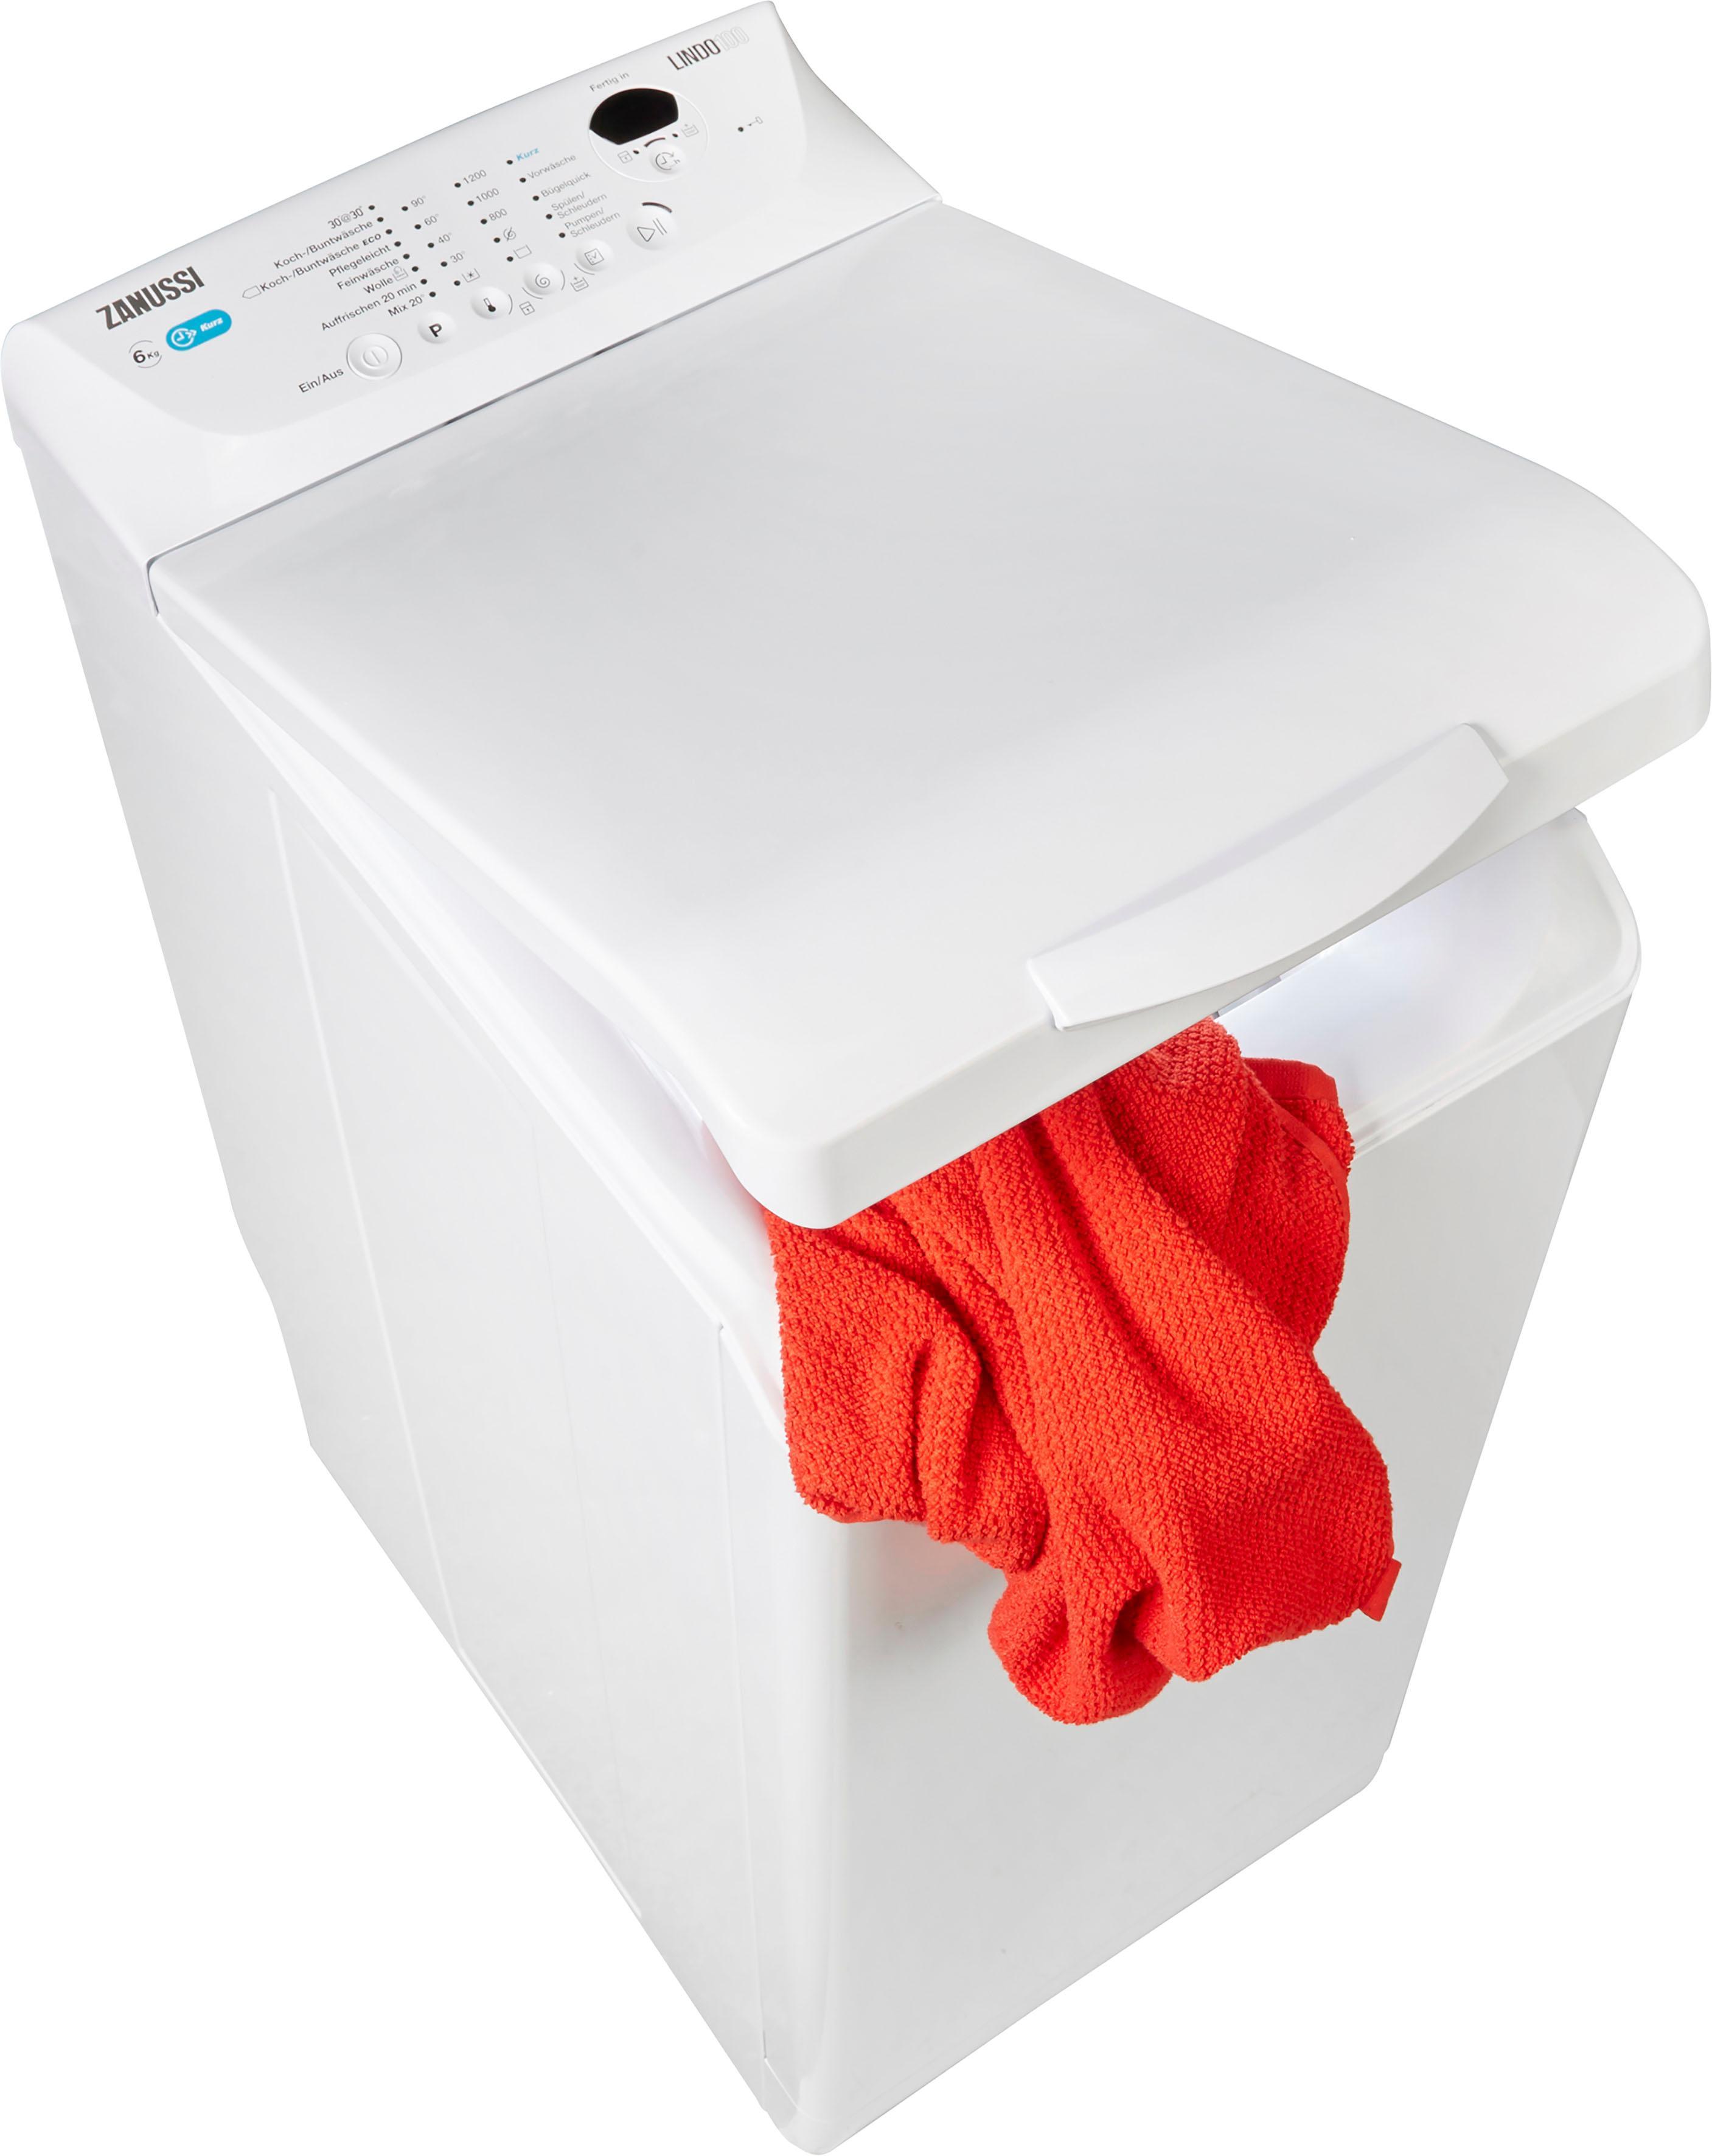 Zanussi Waschmaschine Toplader ZWQ61235CI | Bad > Waschmaschinen und Trockner > Toplader | Zanussi